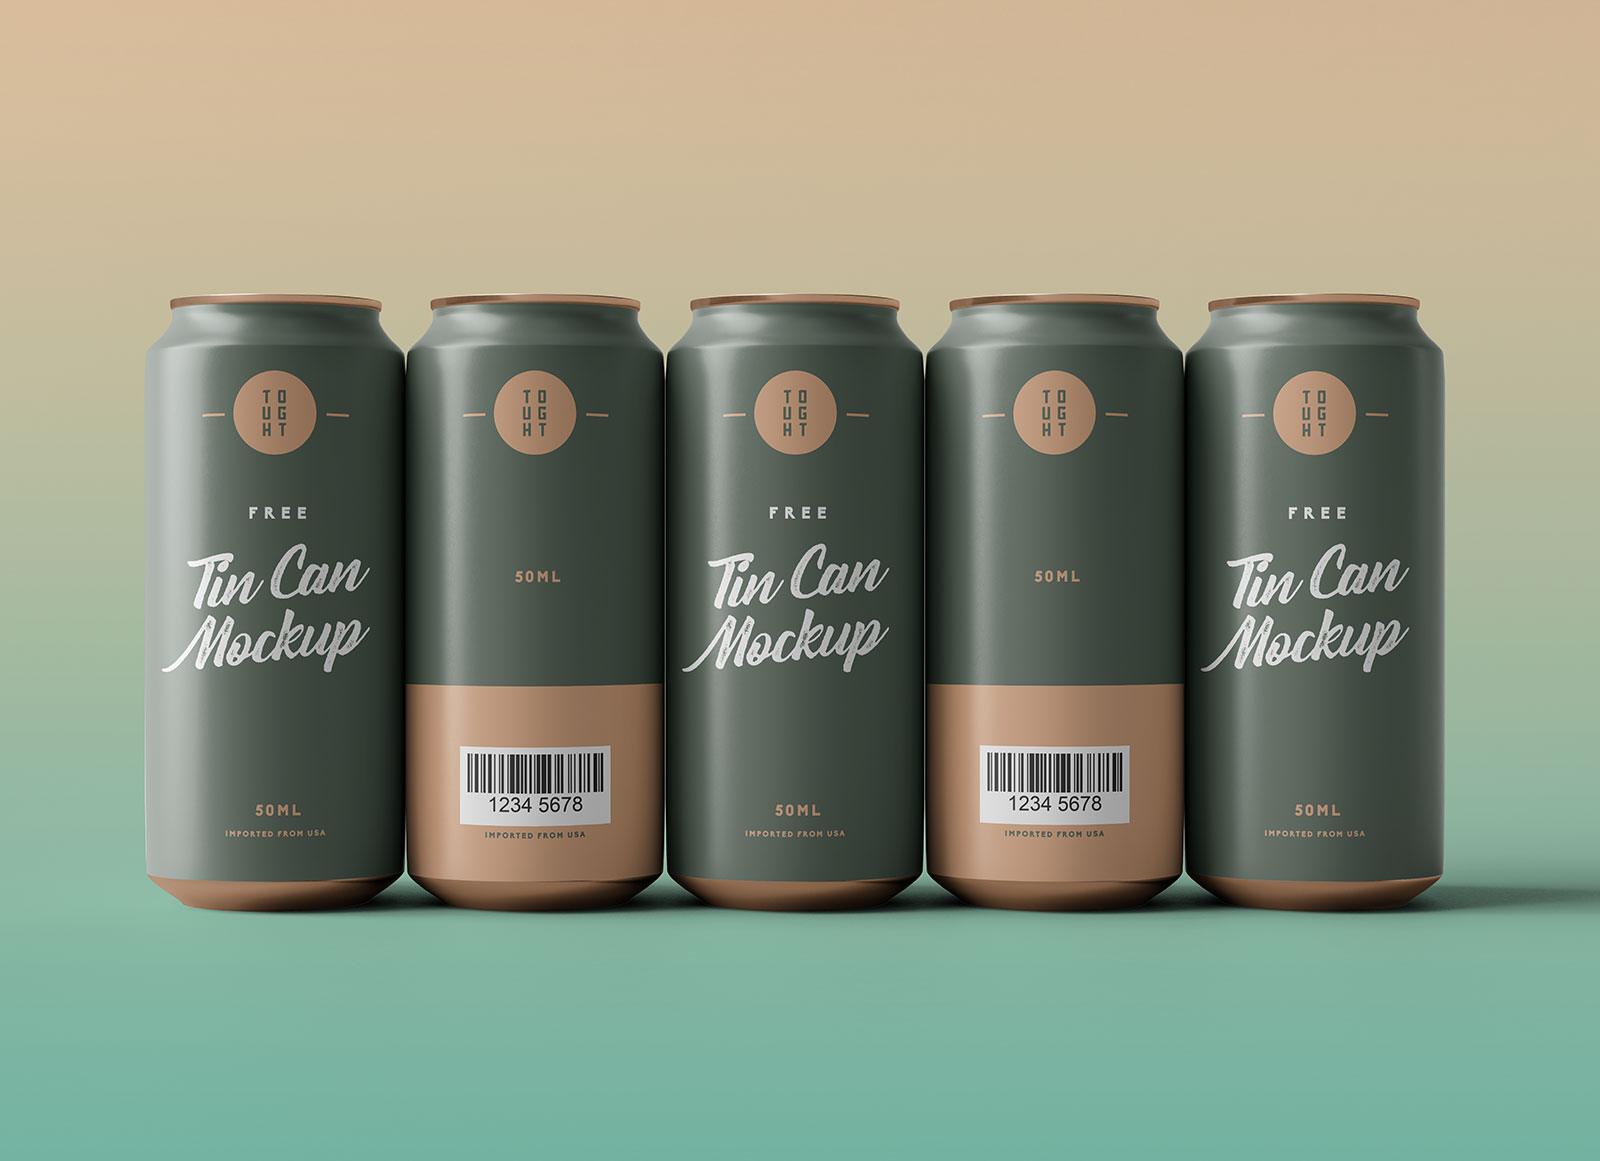 Free-Tin-Can-Set-Mockup-Presentation-PSD